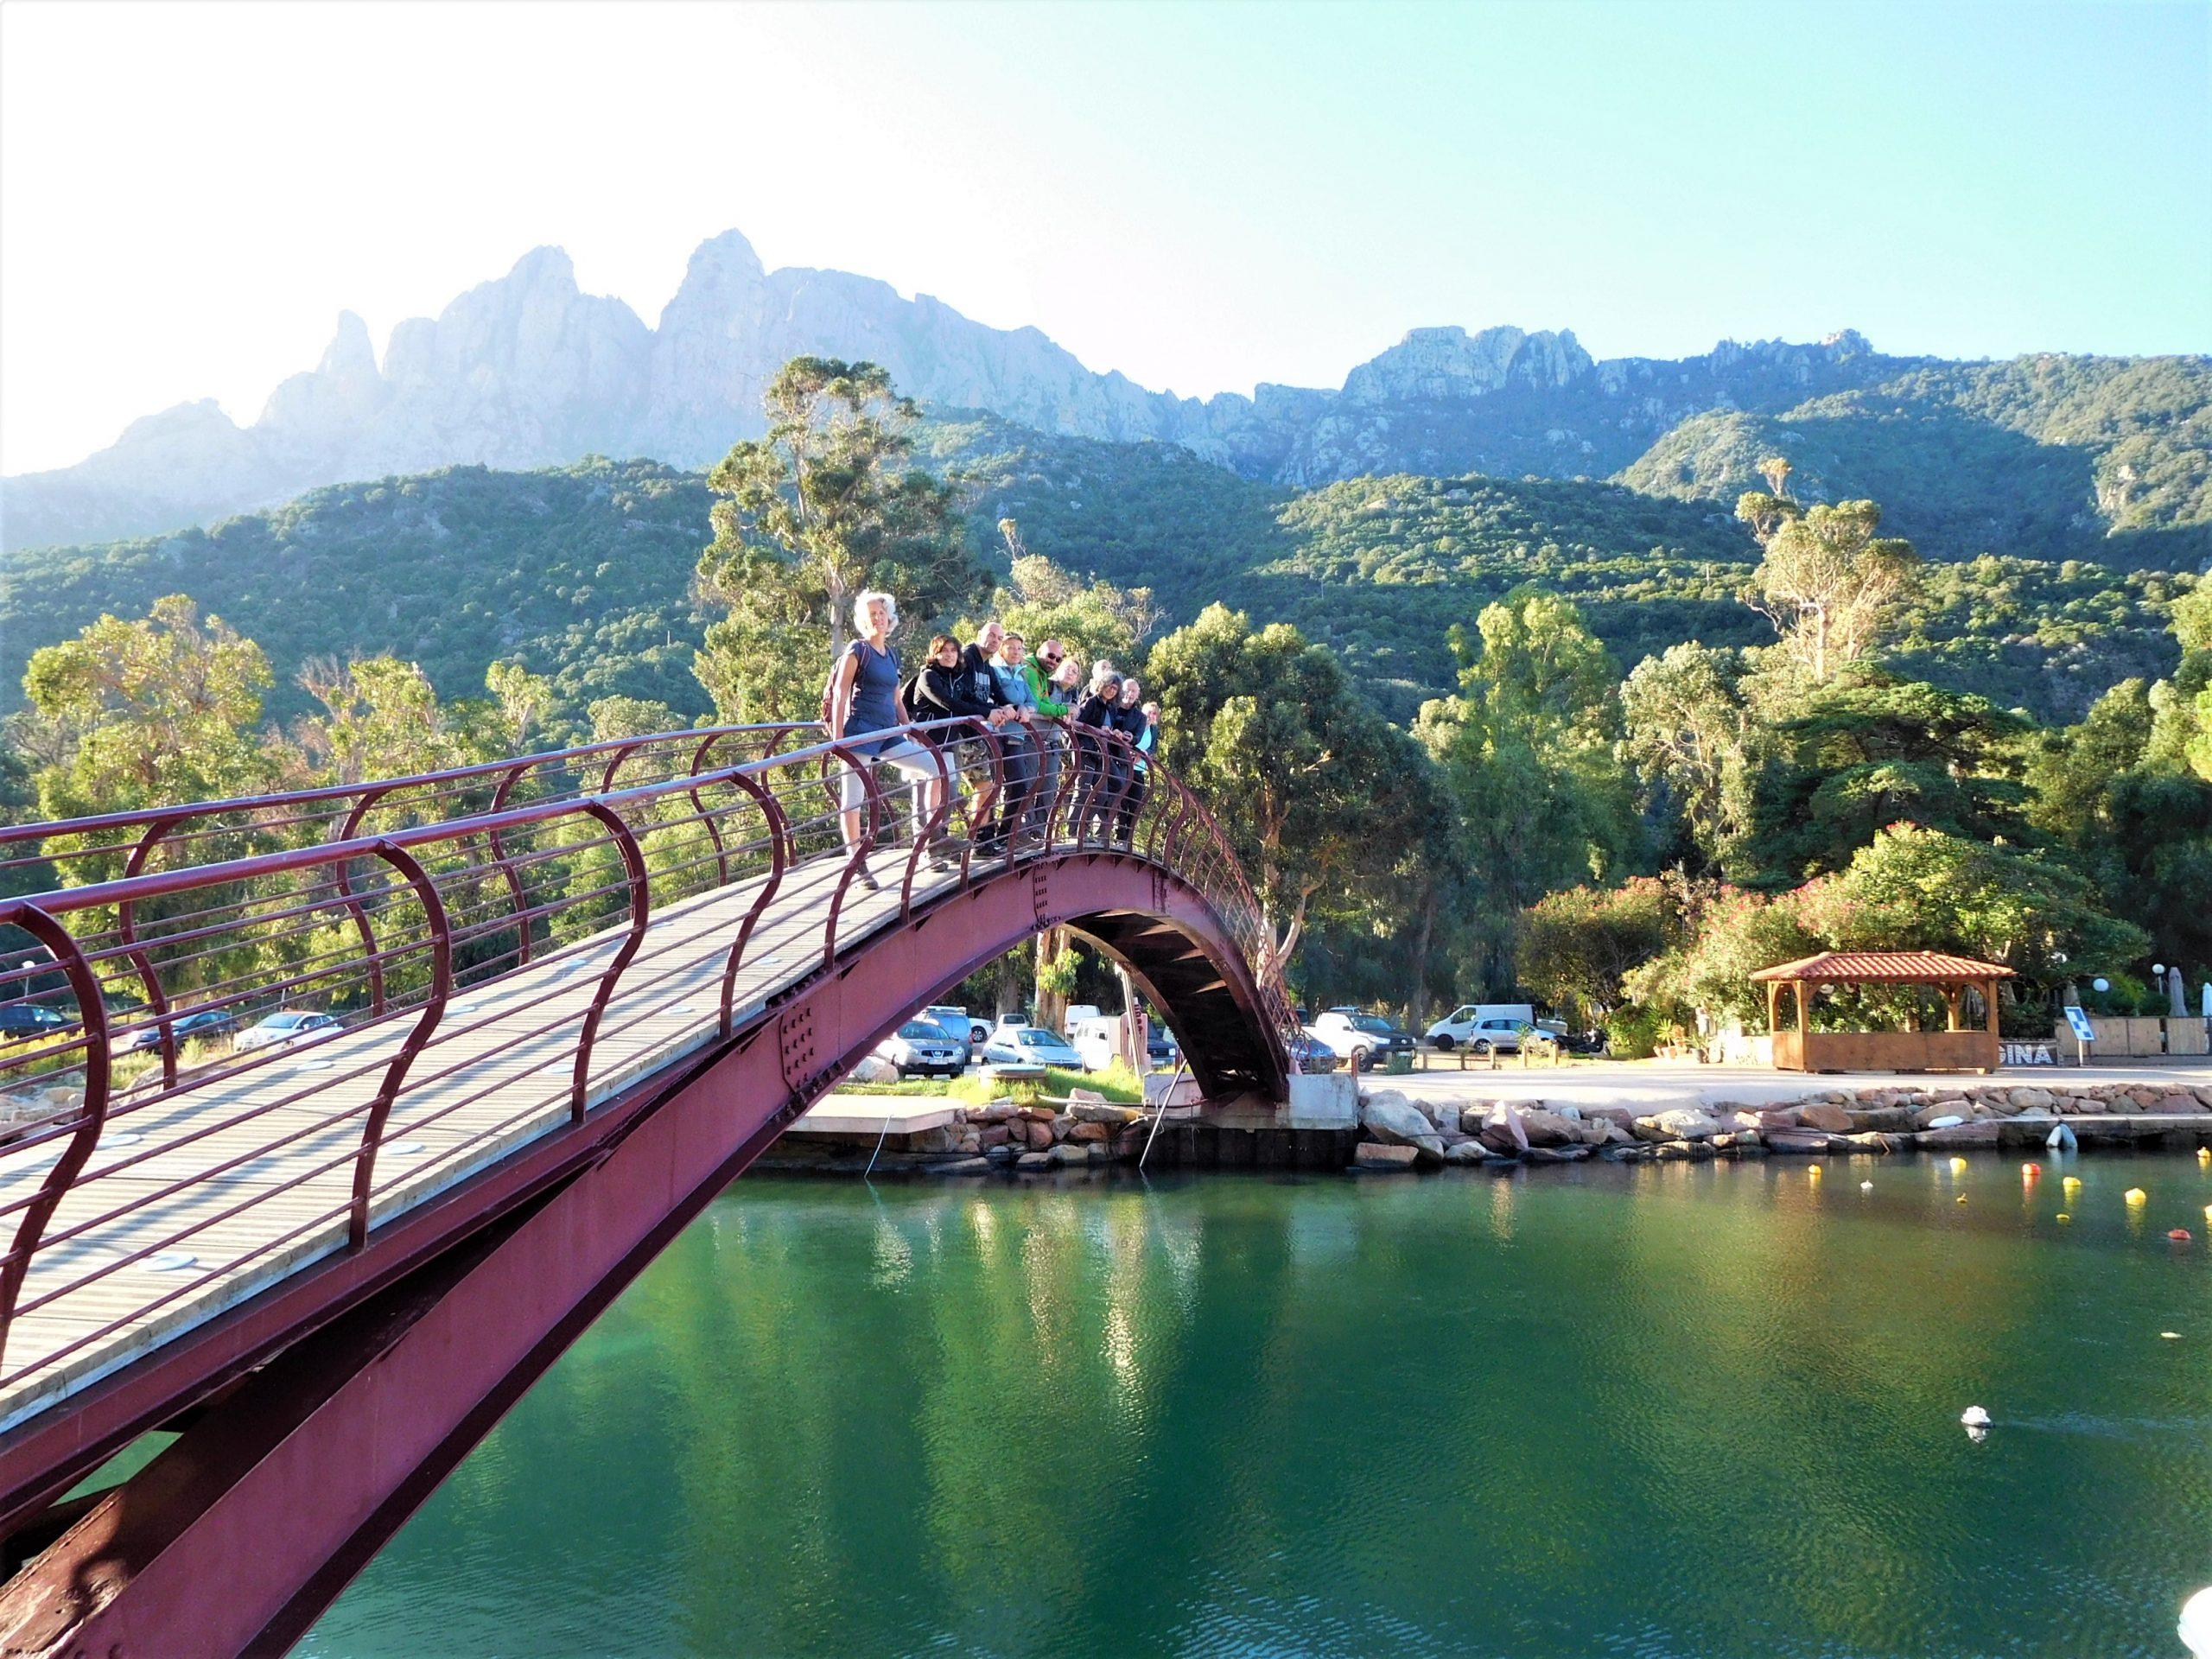 https://www.trekkilandia.it/wp-content/uploads/2020/06/Corsica_Porto-scaled.jpg